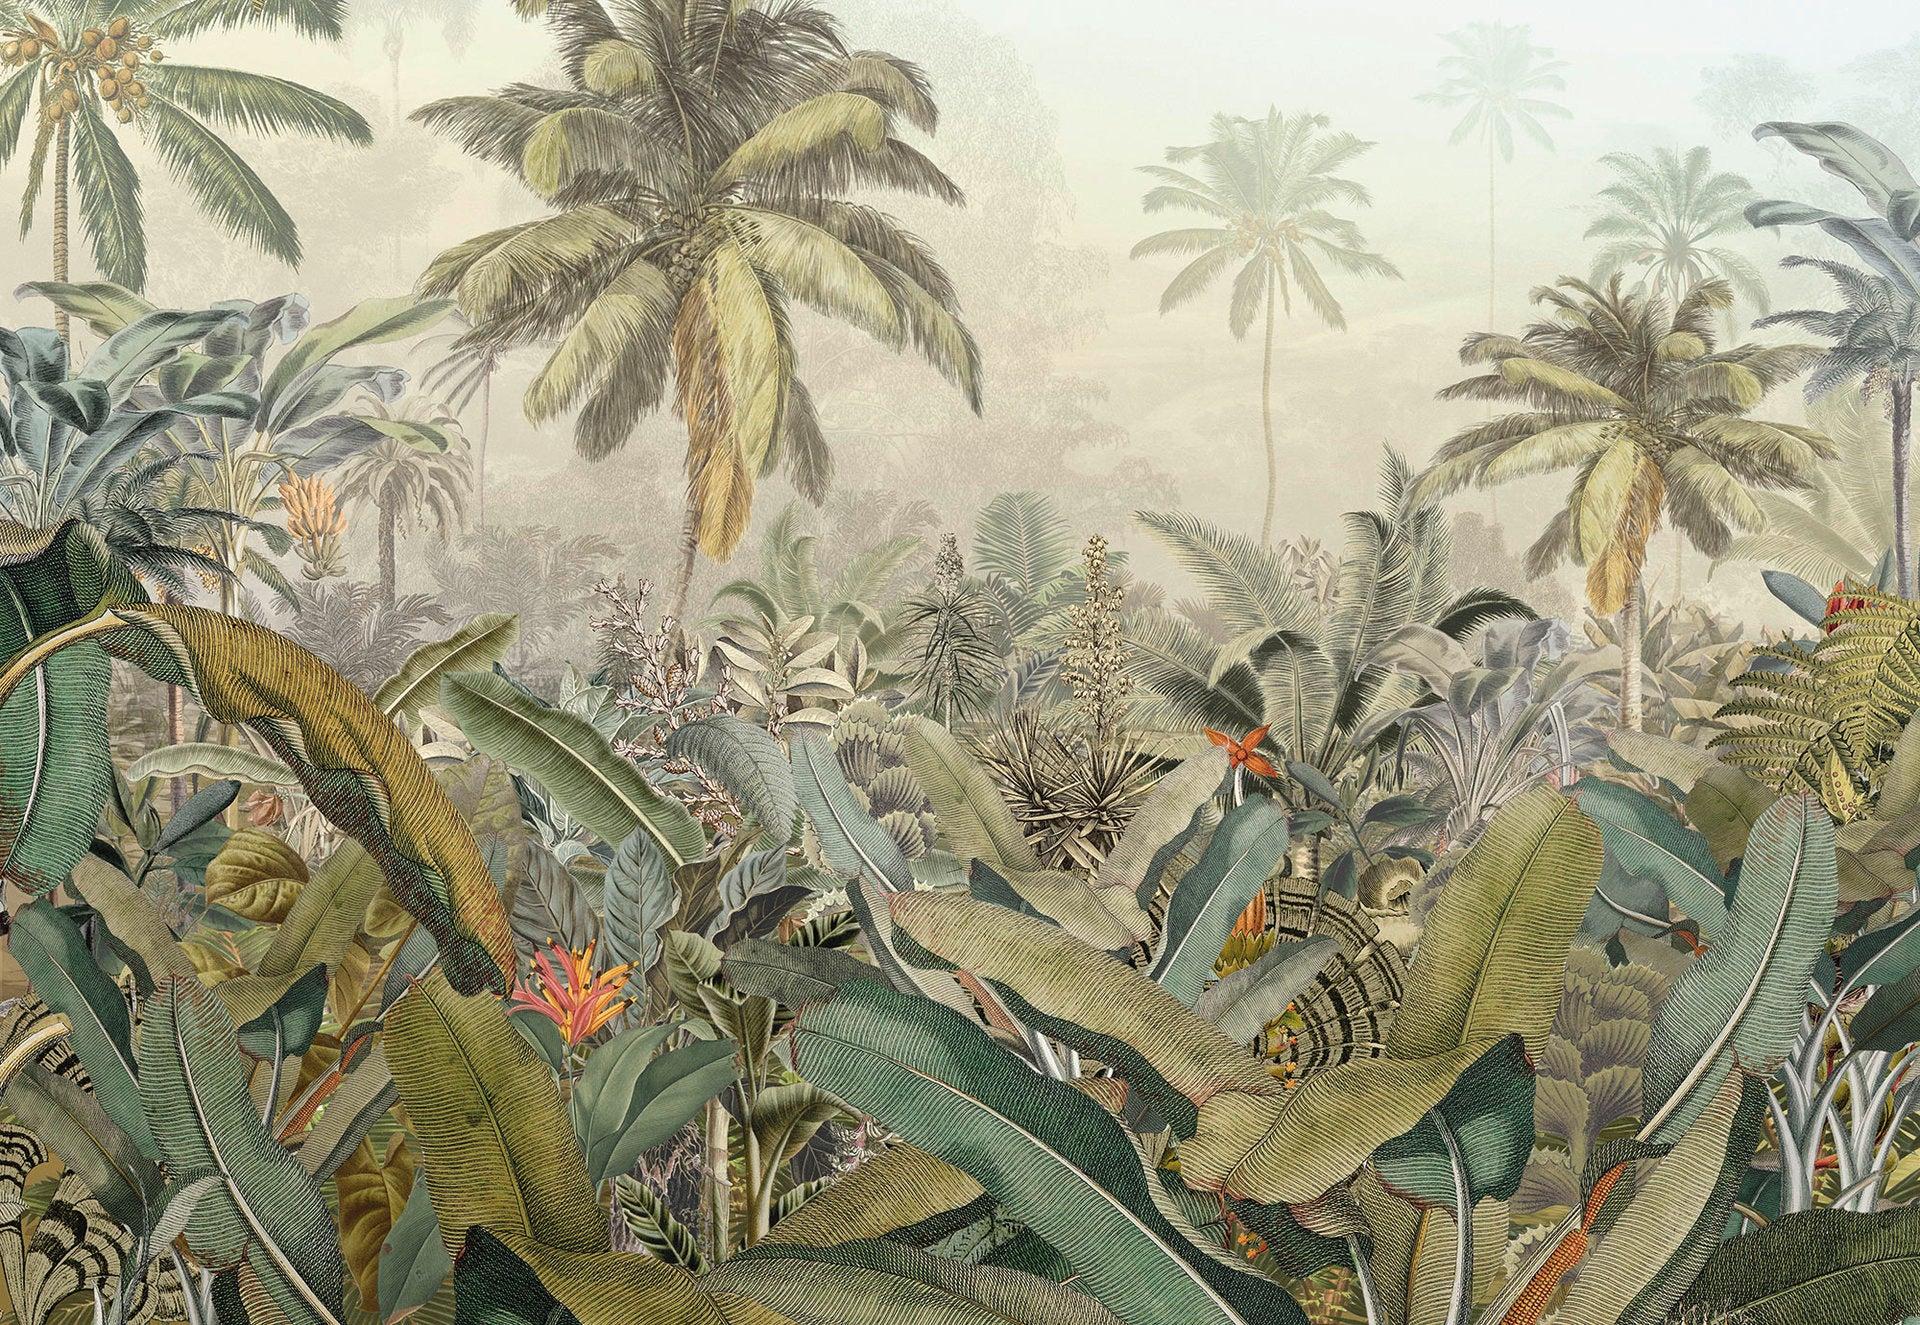 Papier peint panoramique Amazonia beige, vert KOMAR l.368.0 x H.248 cm